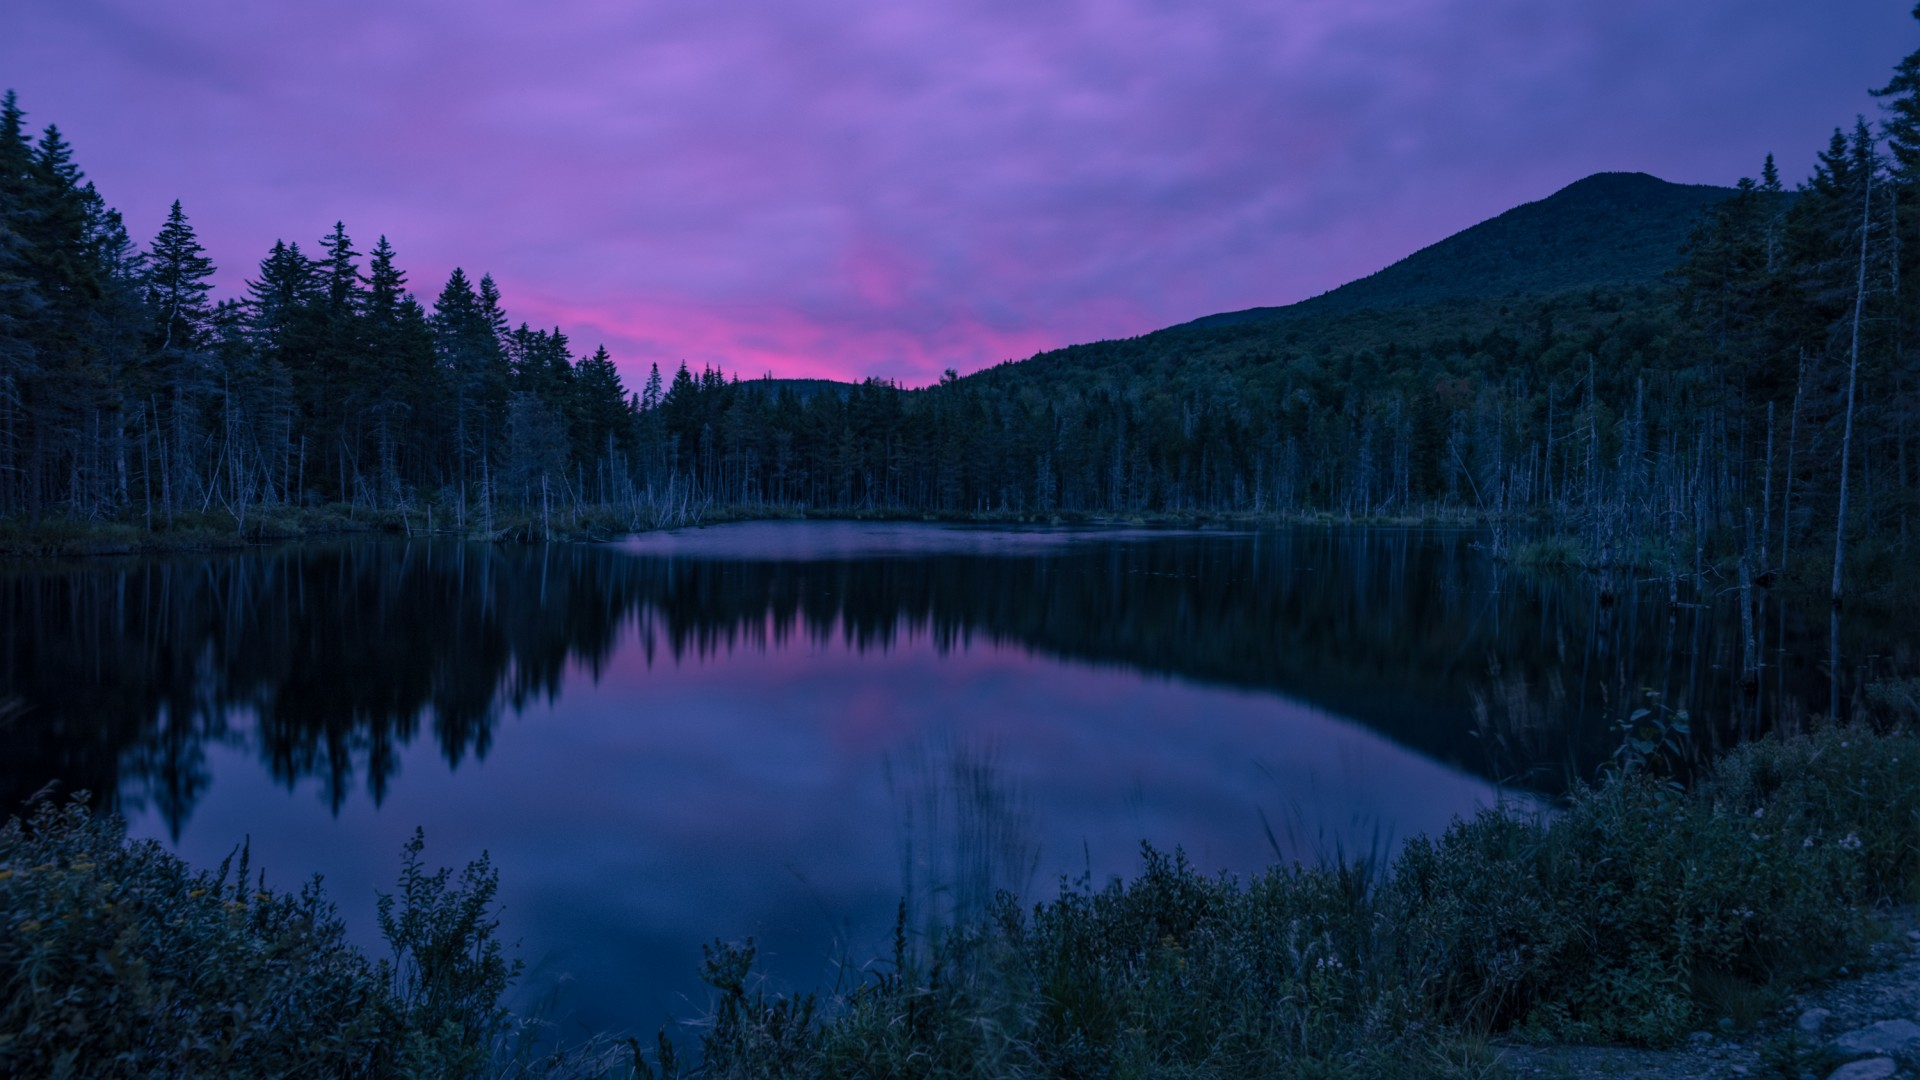 Wallpaper River, Forest, Sky, Evening, HD, Nature #15669